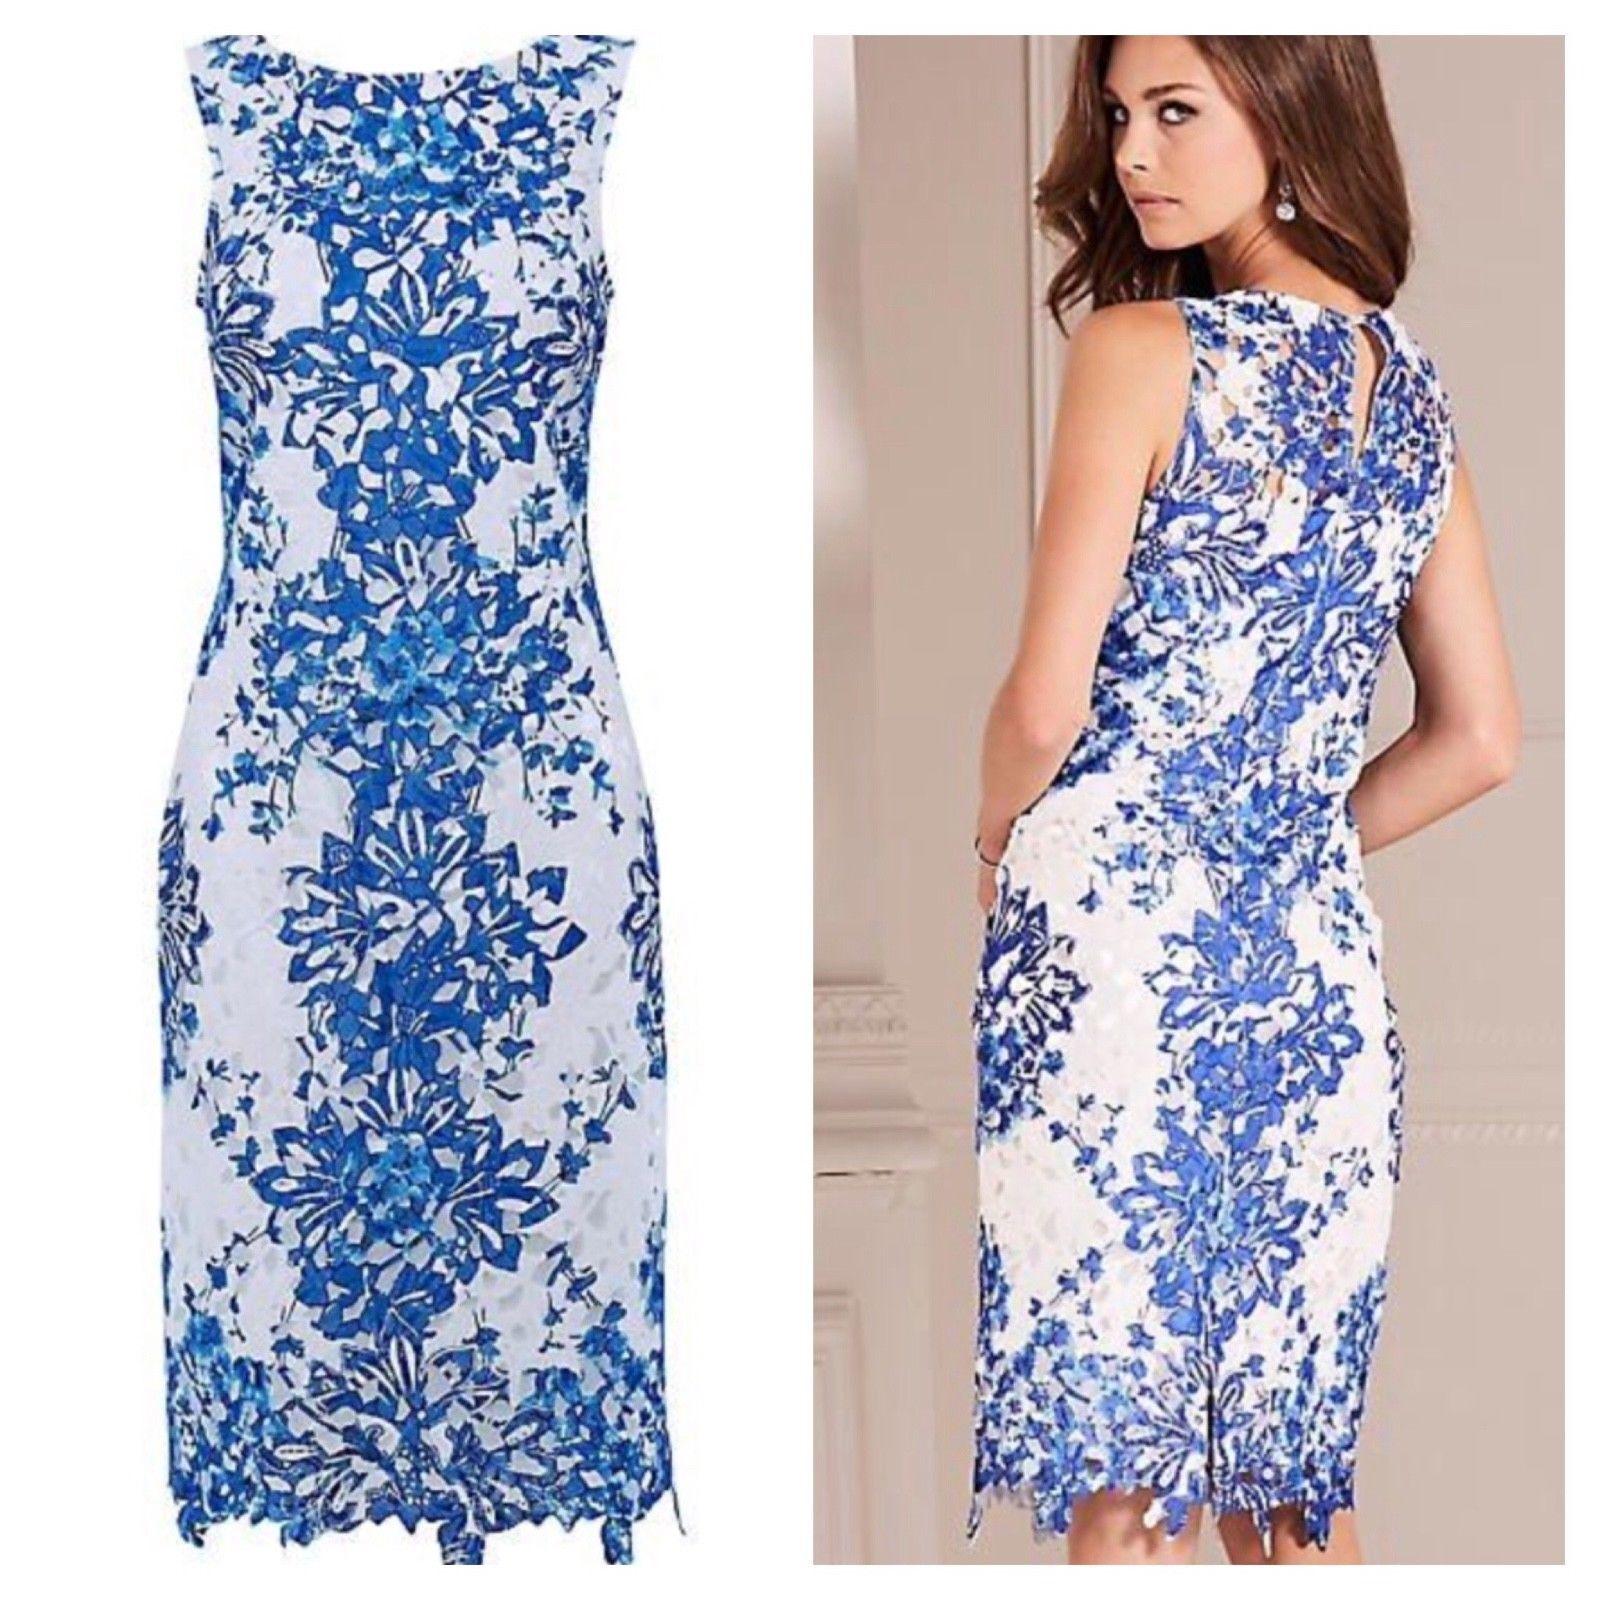 Kaleidoscope Size 10 bluee Lace Printed Shift DRESS Occasion Wedding Evening